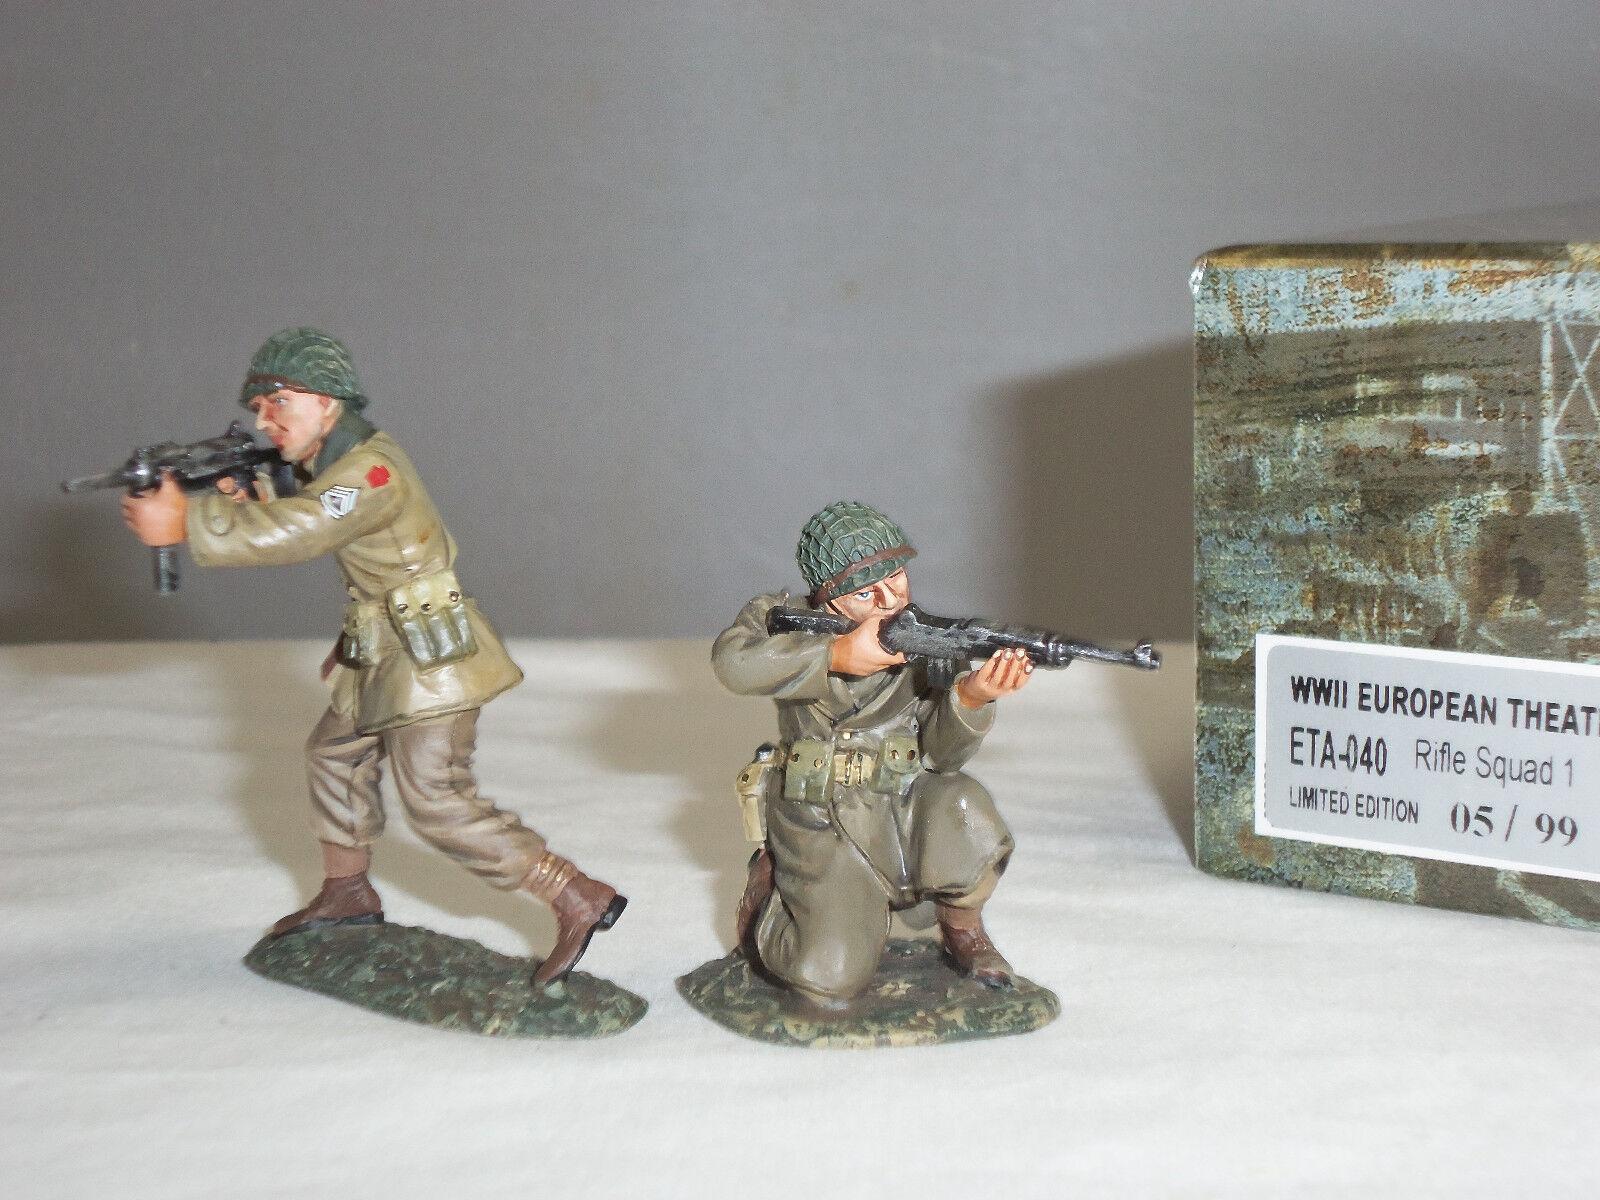 FIGARTI ETA040 BRITISH ARMY RIFLE SQUAD WORLD WAR TWO METAL TOY SOLDIER SET